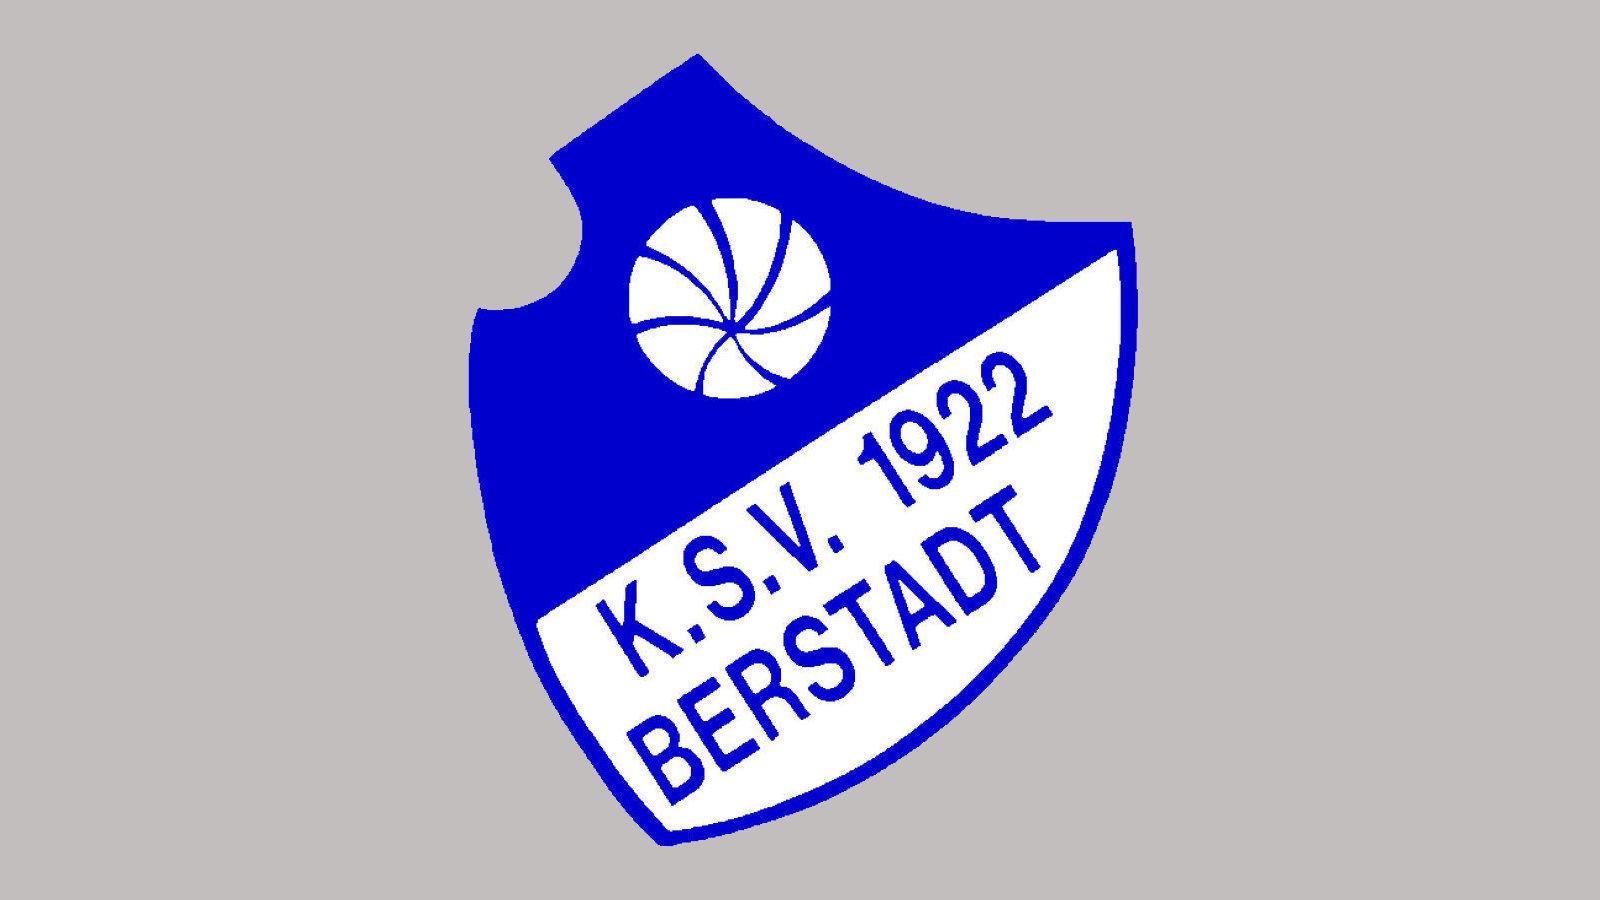 Kultur- und Sportverein 1922 Berstadt e.V.